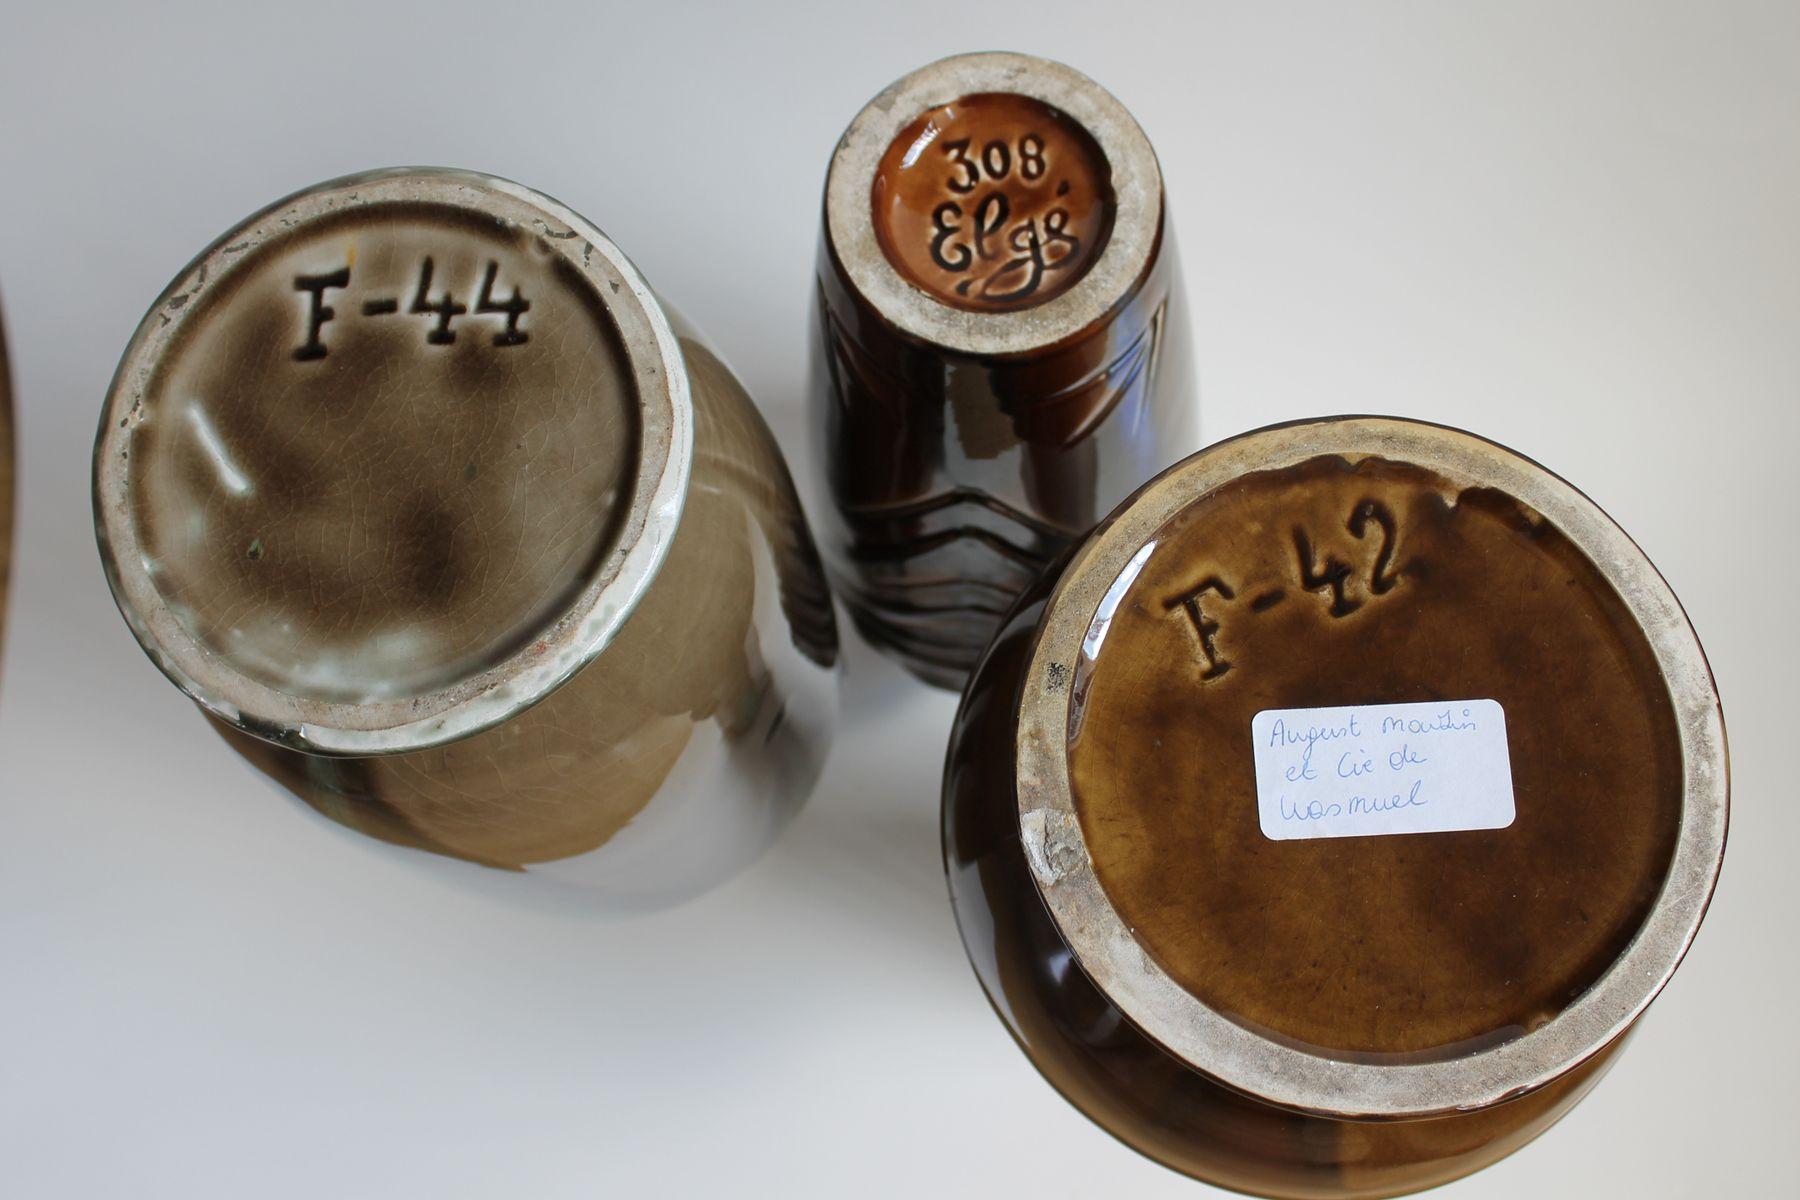 art deco vases from august mouzin et cie 1930s set of 3. Black Bedroom Furniture Sets. Home Design Ideas